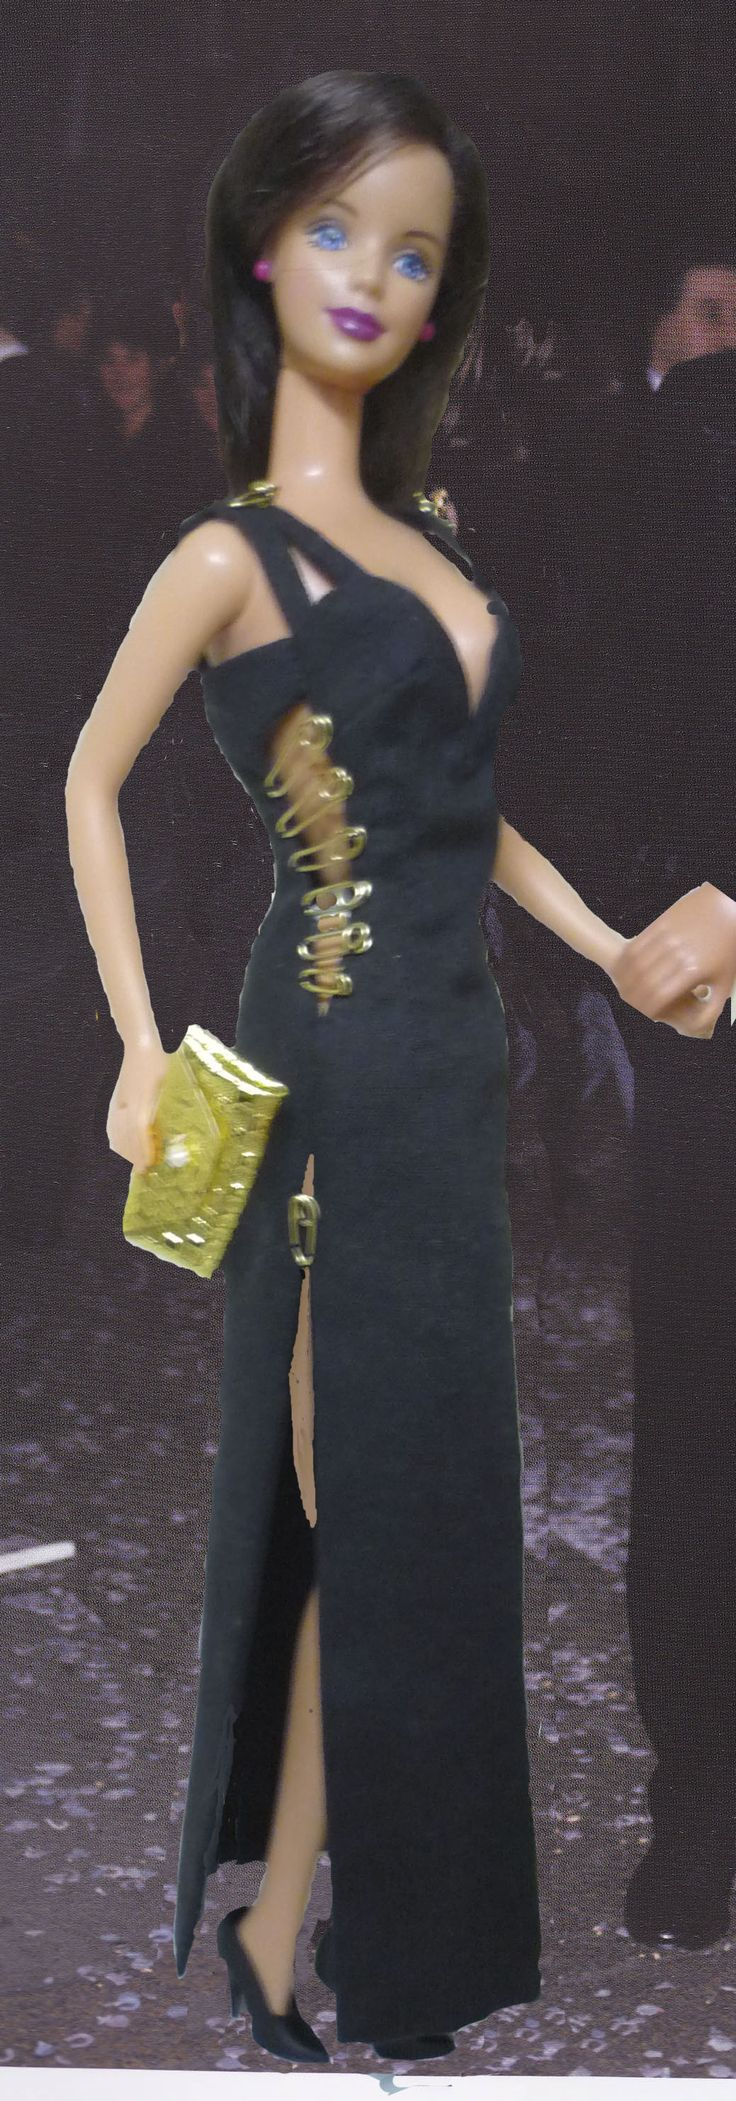 Liz hurley versace dress - Liz Hurley Versace Safety Pin Dress